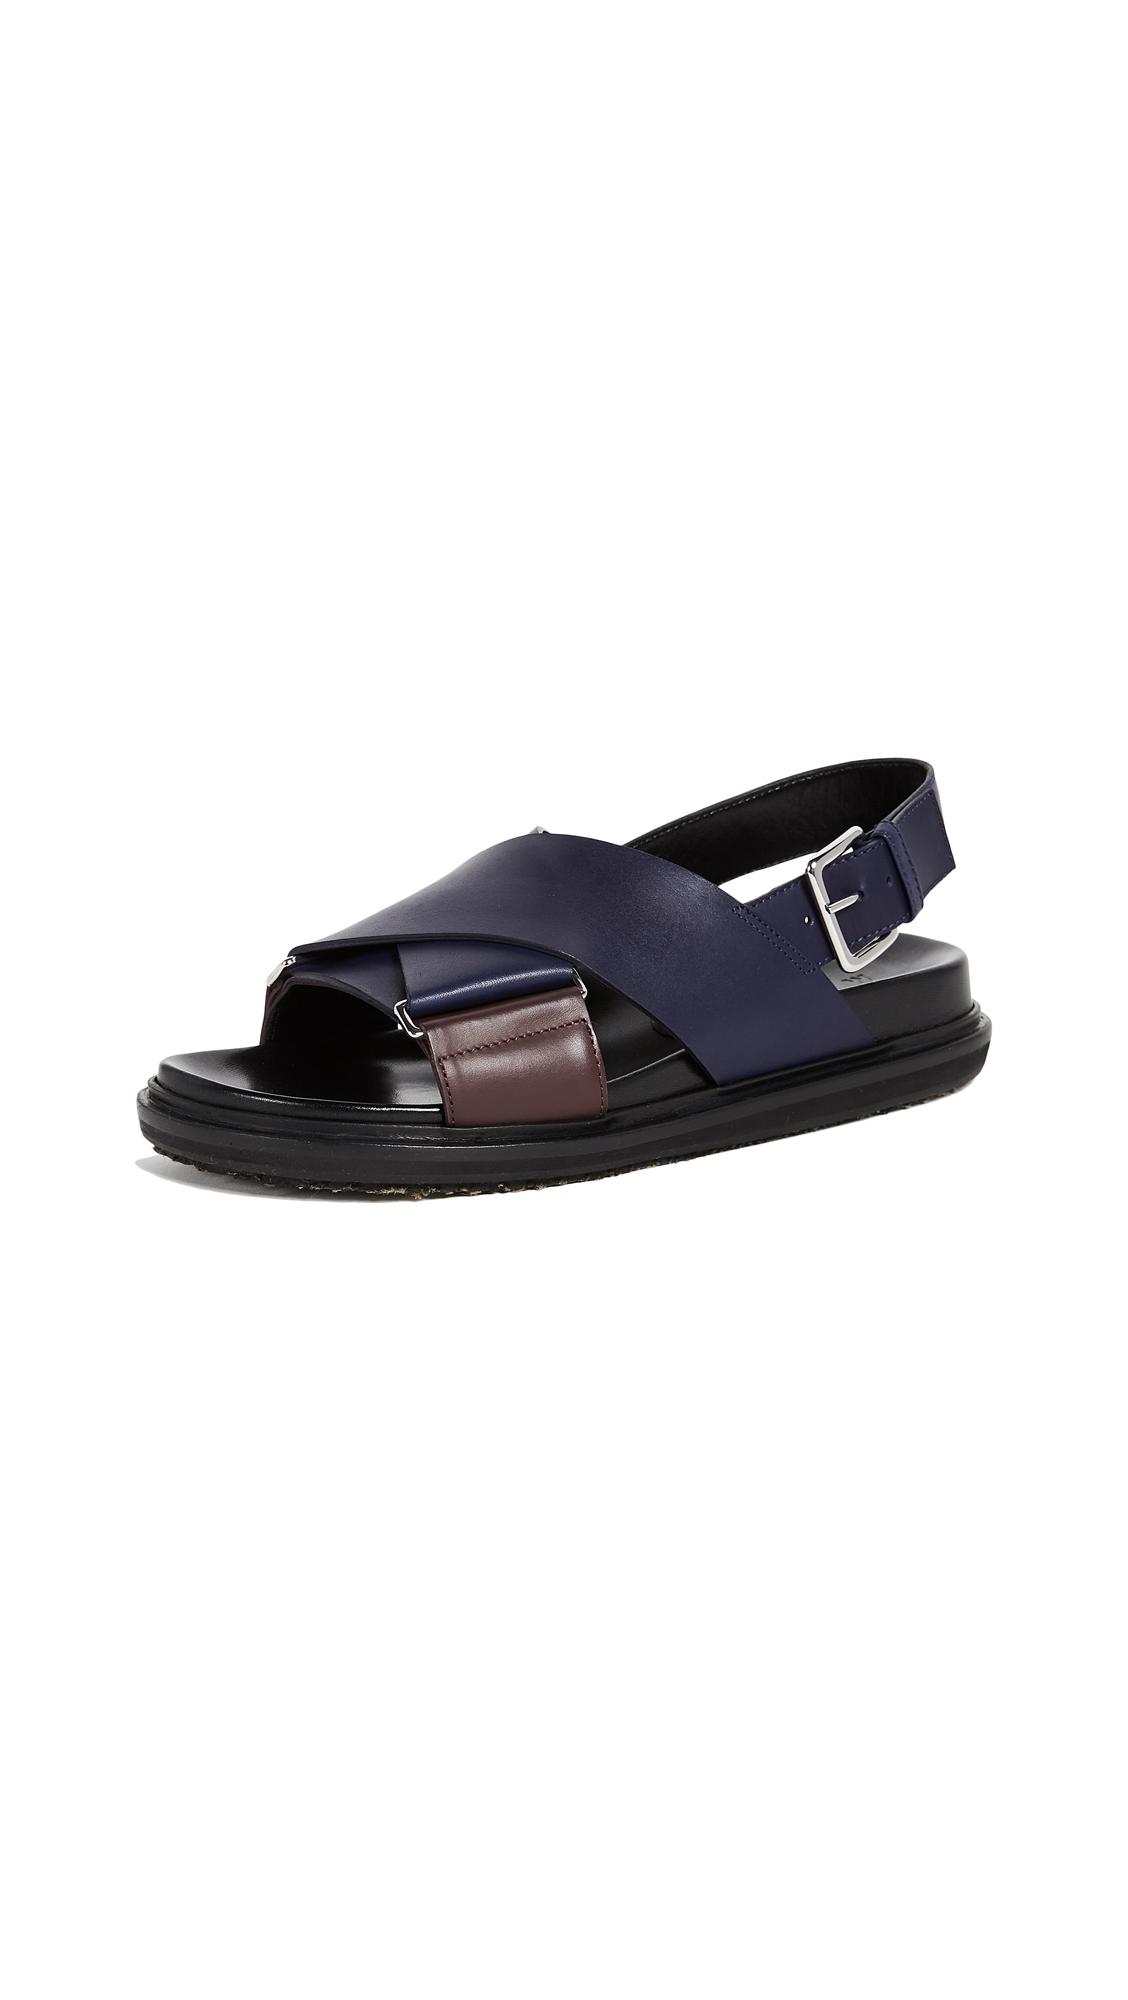 Marni Fussbett Sandals - Burgundy/Ocean